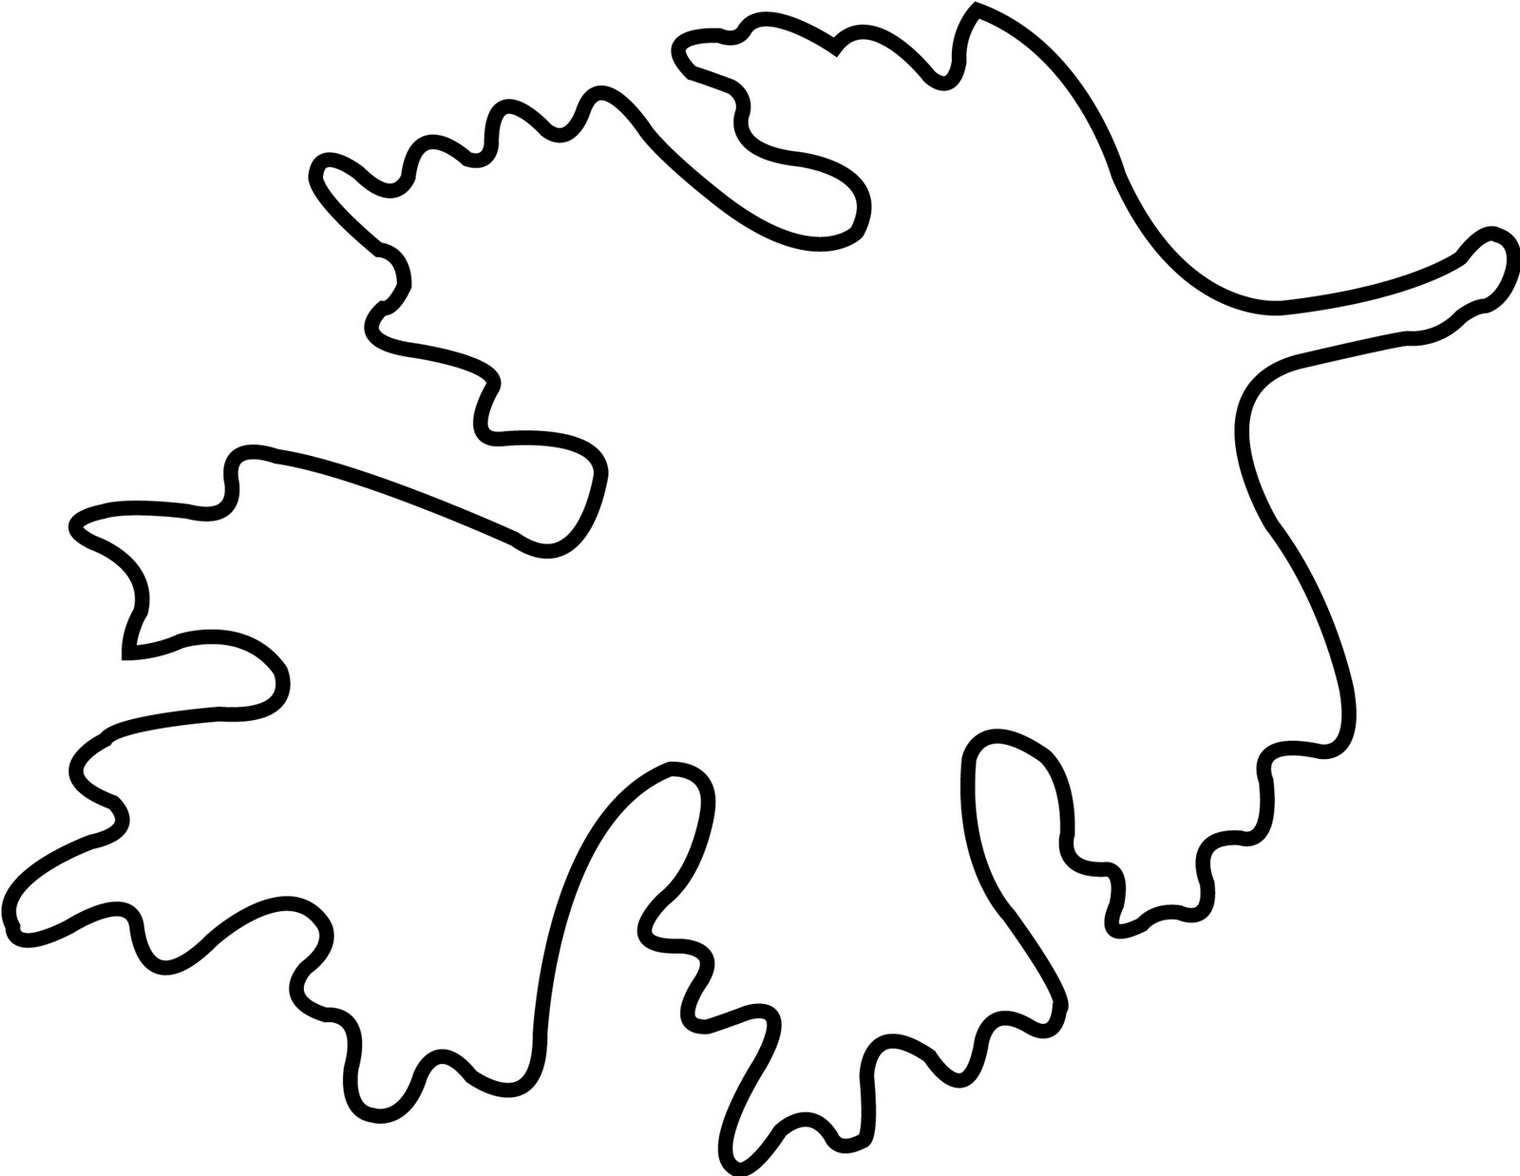 1520x1176 Leaf Outline Template Clipart To Use Clip Art Resource Oak Leaf